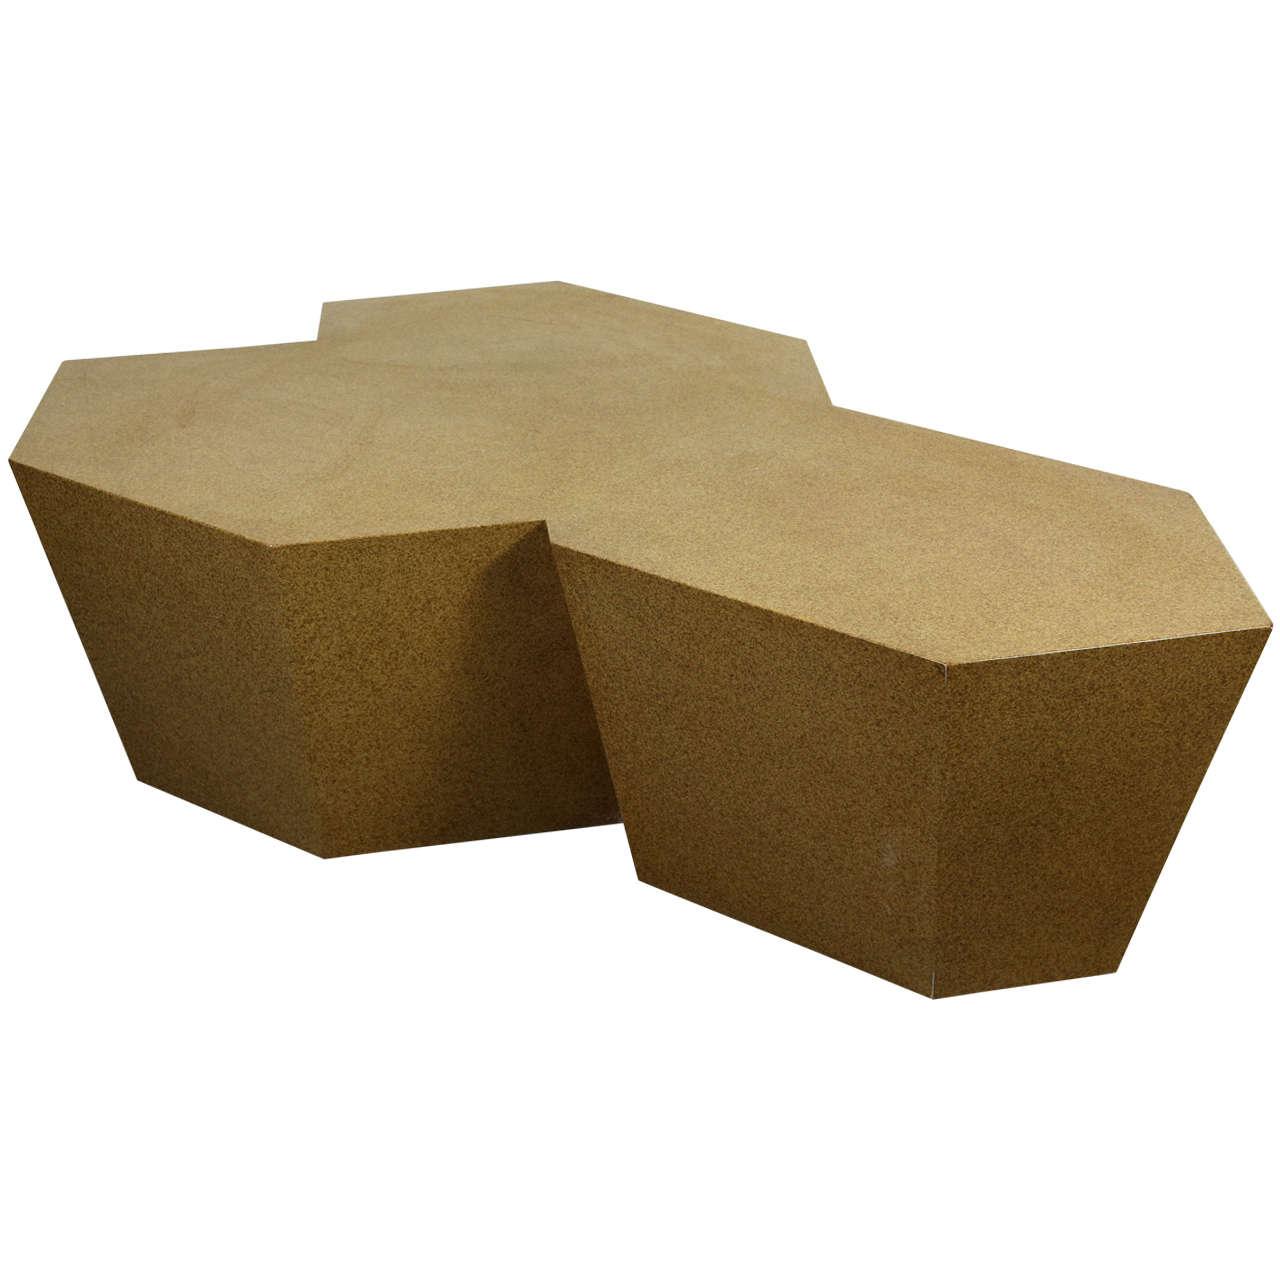 Beautiful geometric coffee table by steve chase at 1stdibs for Geometric coffee table